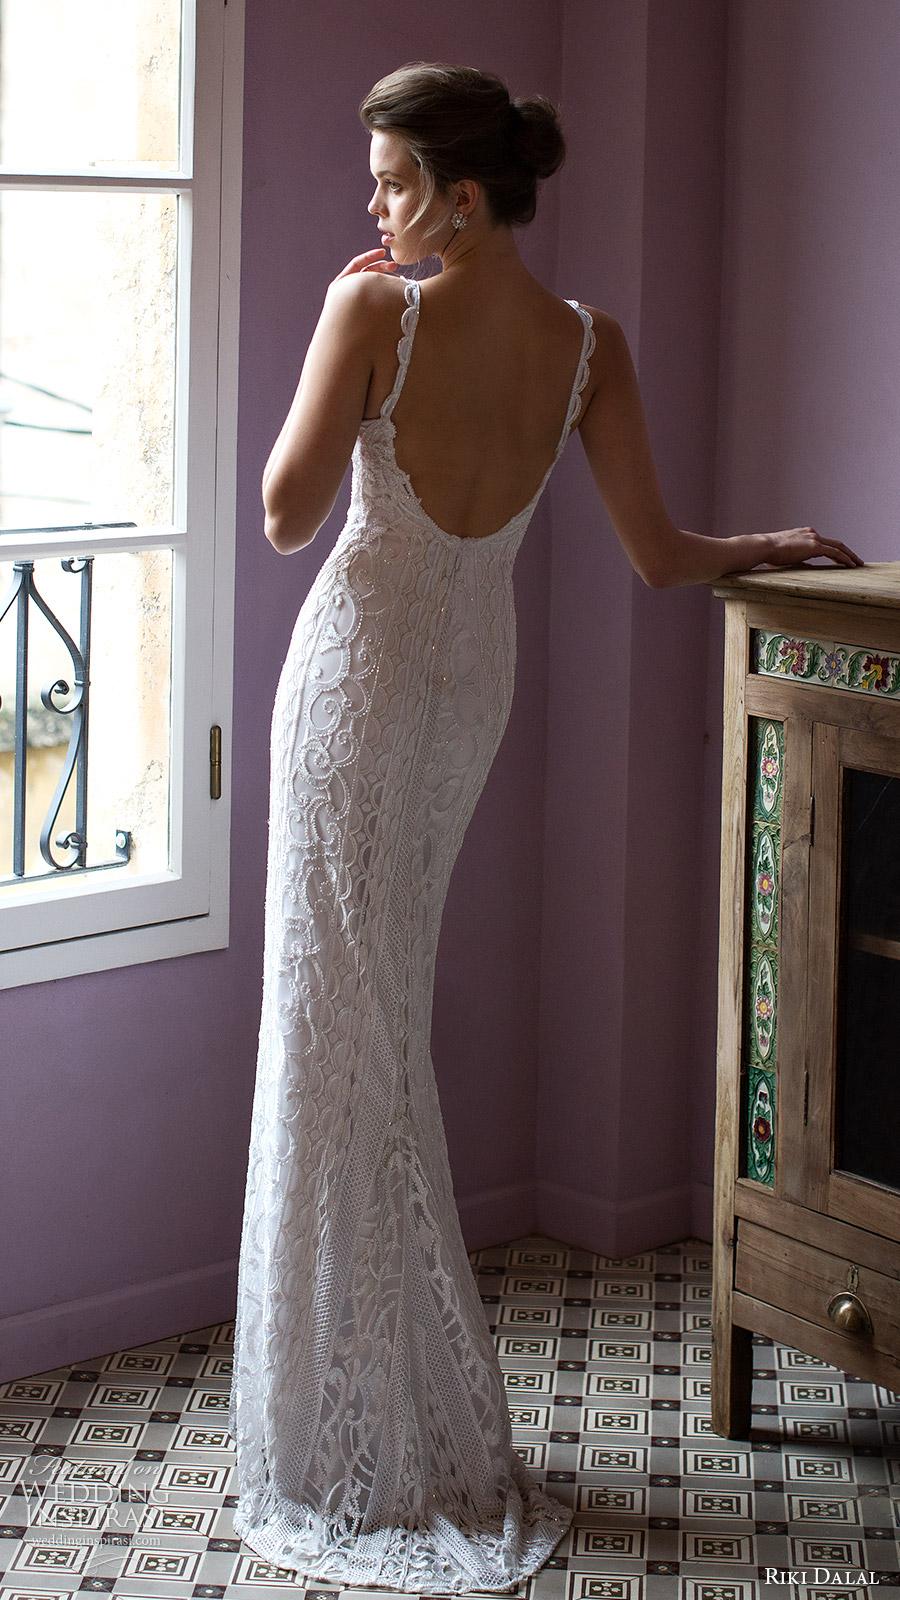 riki dalal bridal 2016 sleeveless deep sweetheart lace strap beaded sheath wedding dress (1812) bv elegant glam